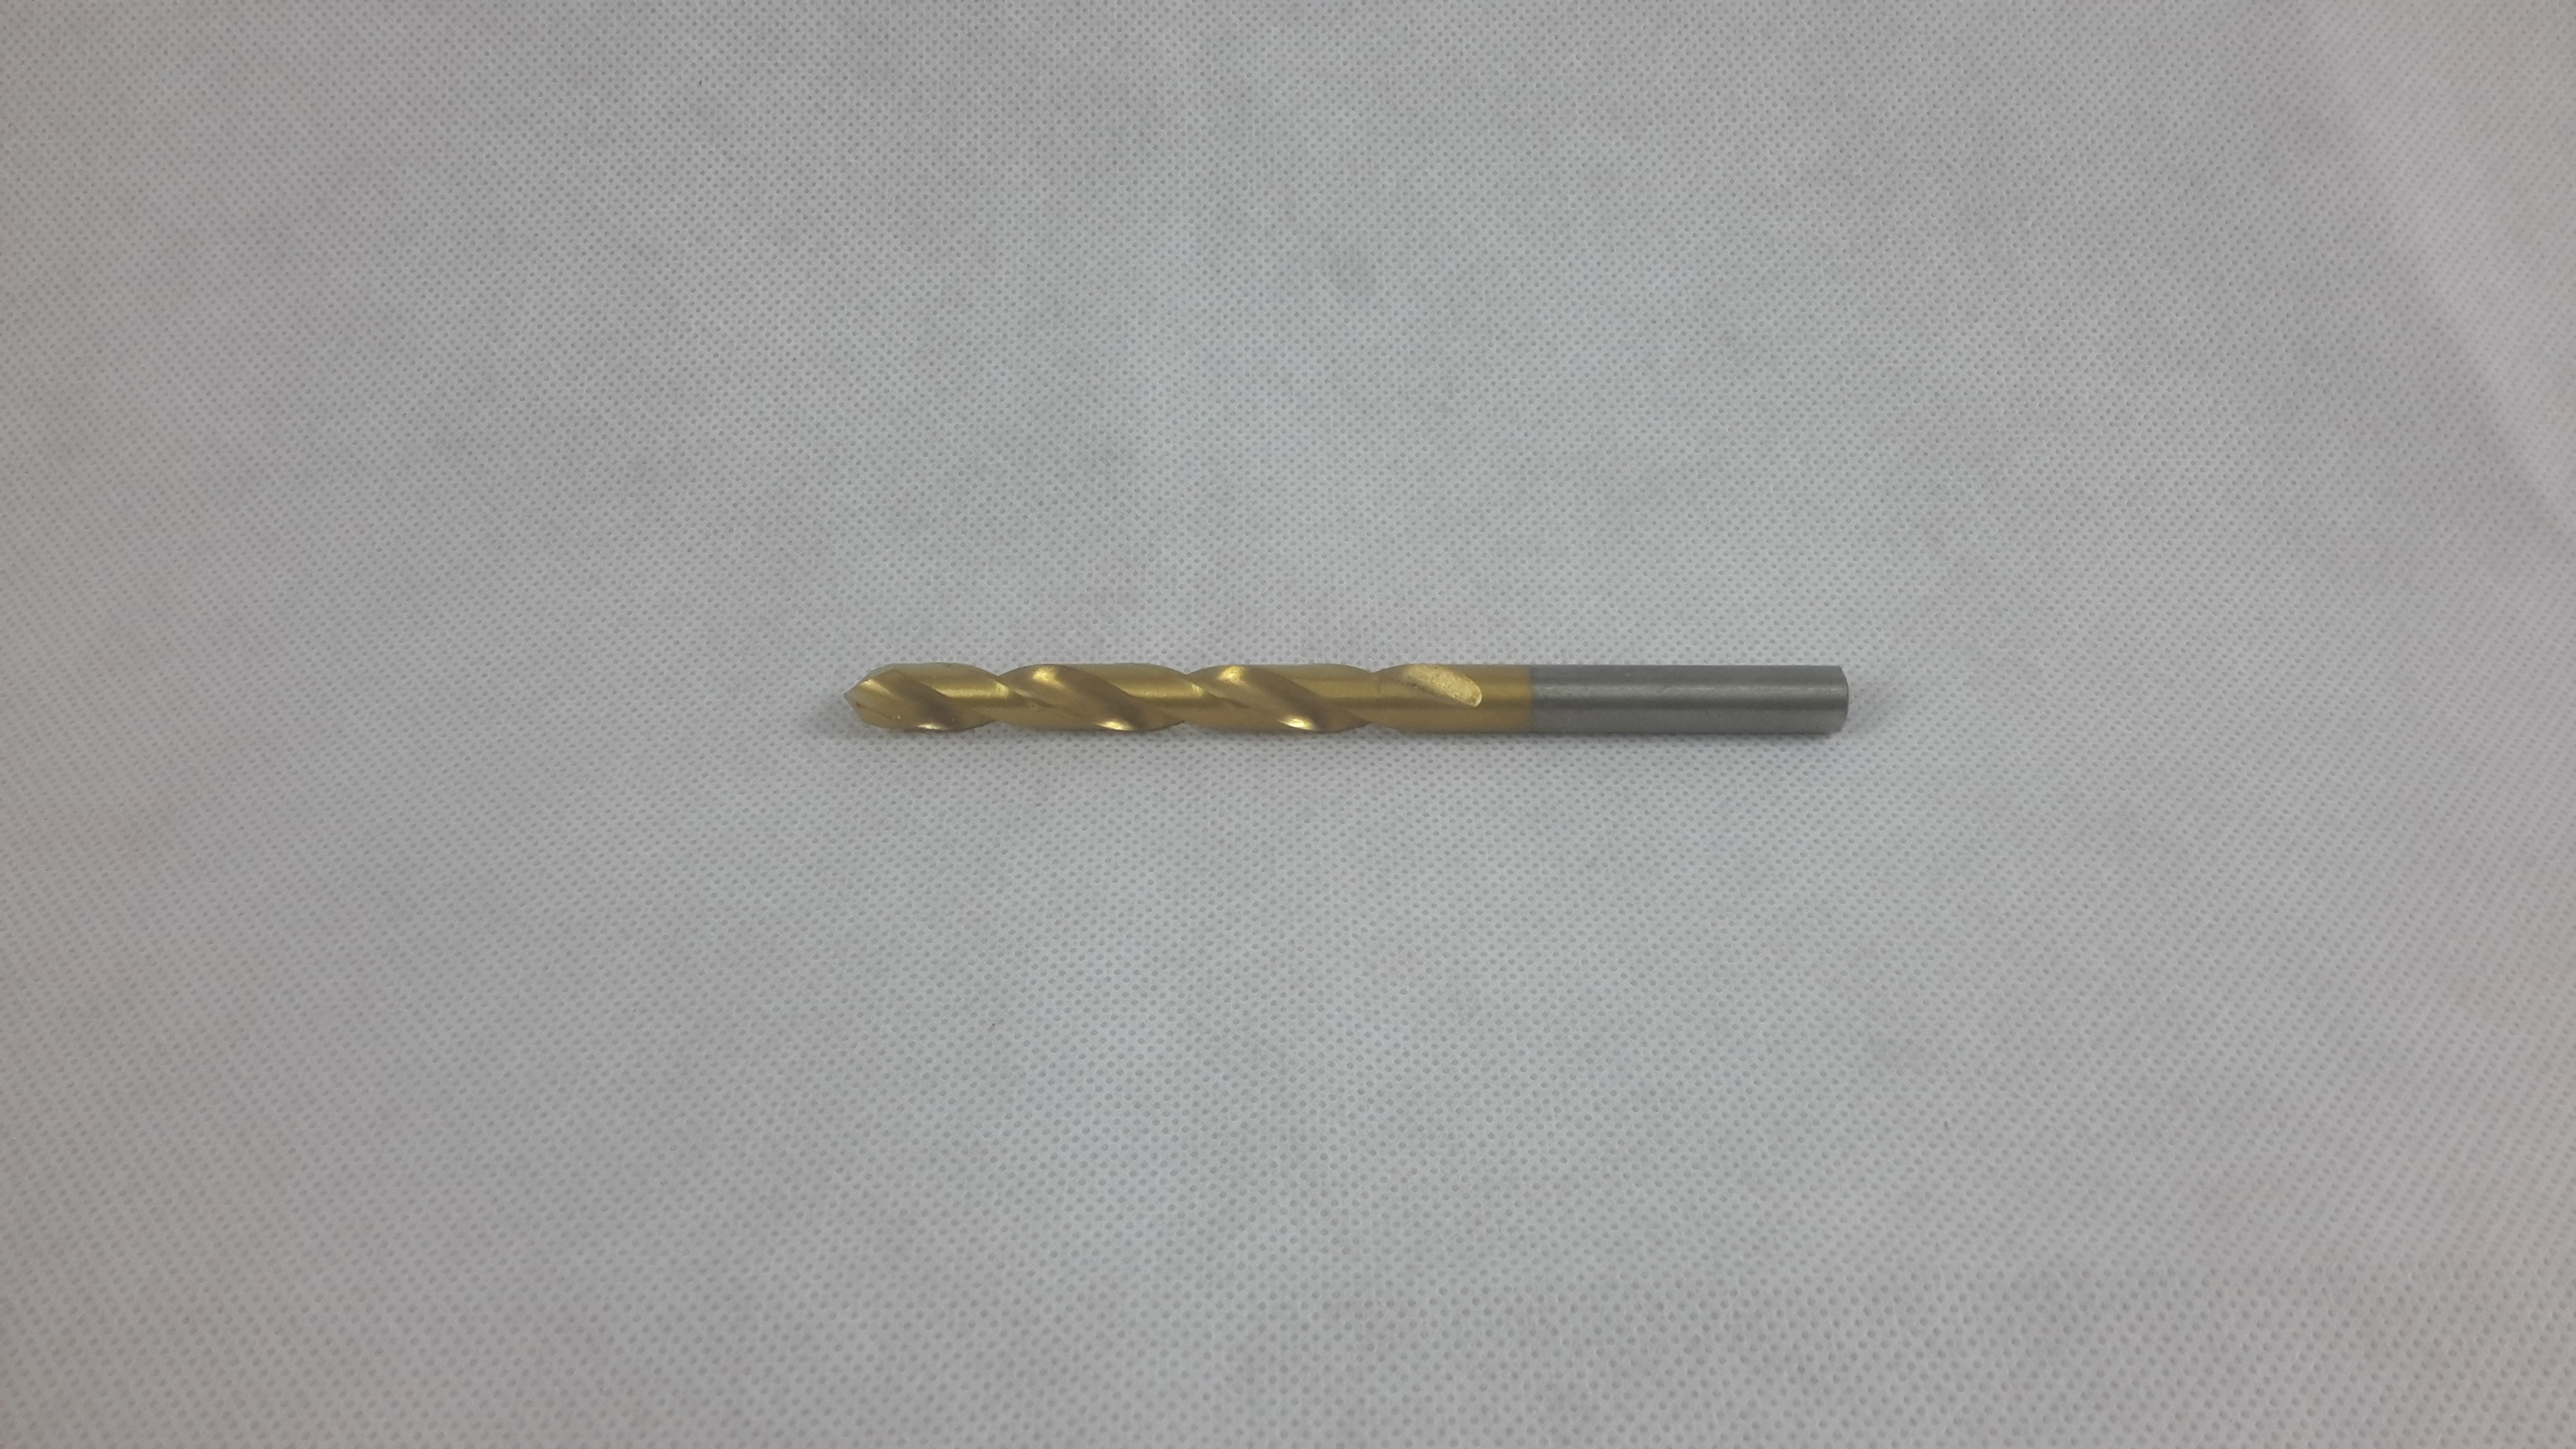 HSS Spiralbohrer DIN 338